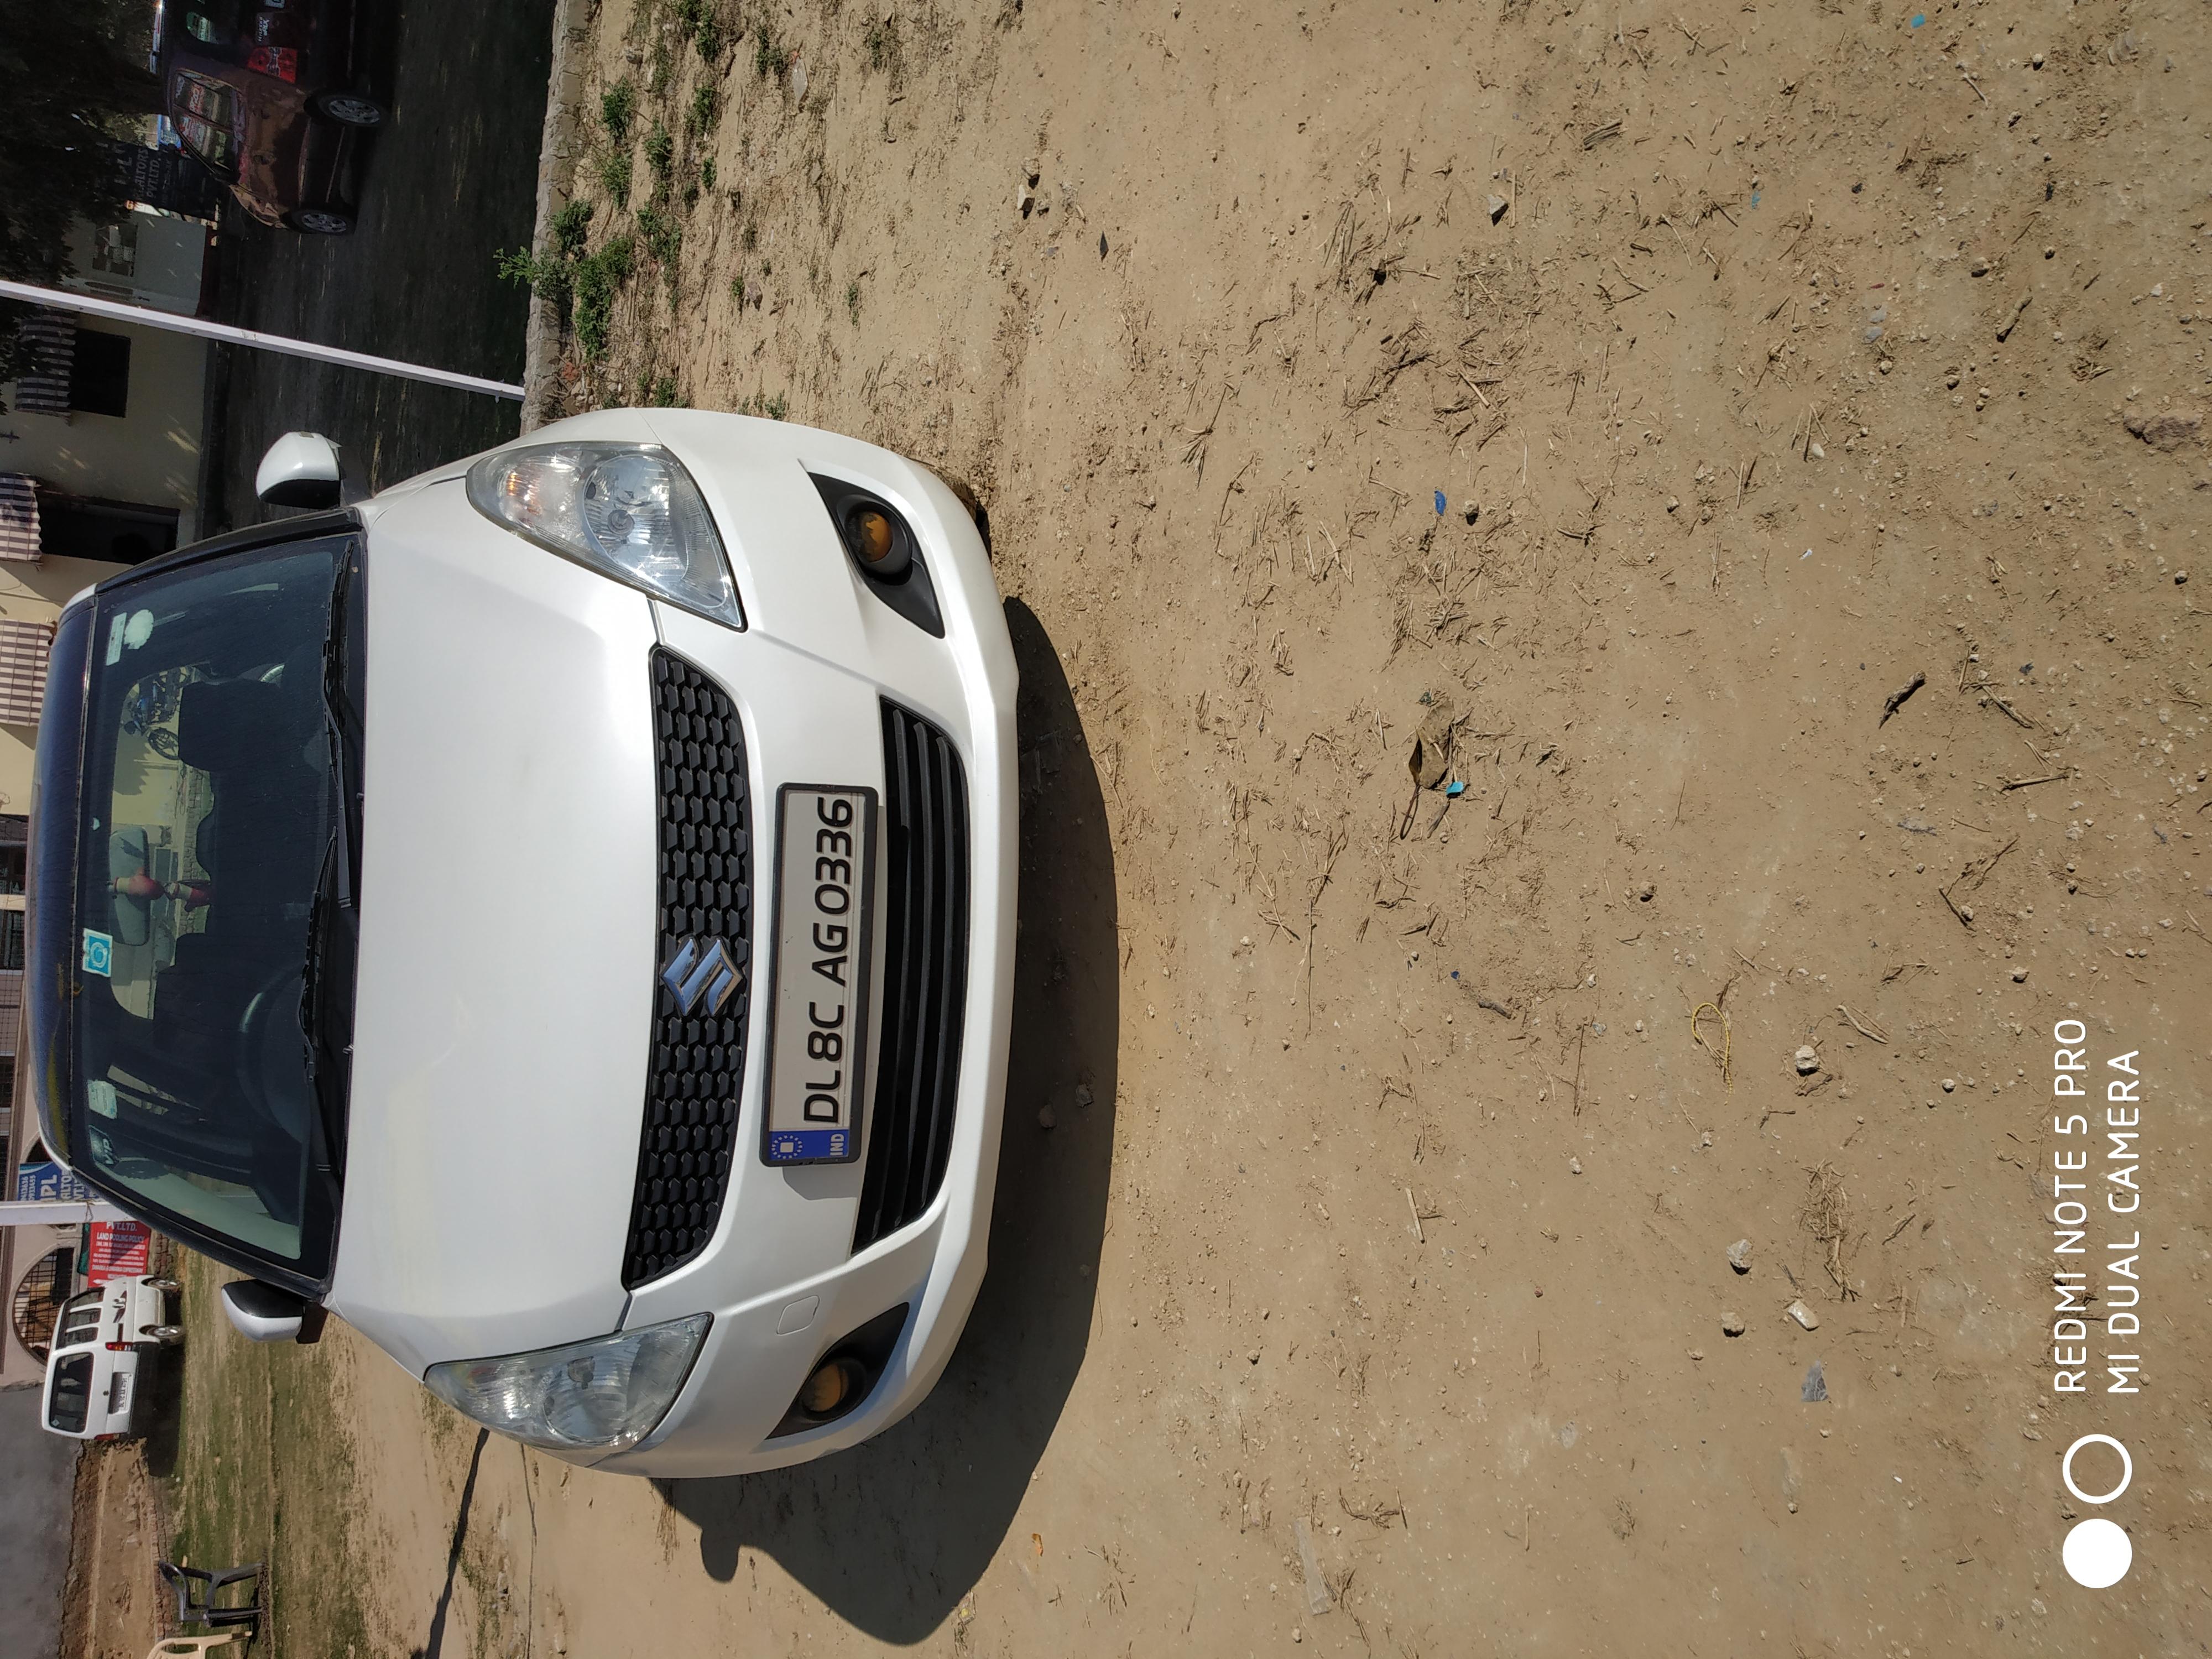 Secondhand Swift vdi car in Dwarka and Uttam Nagar